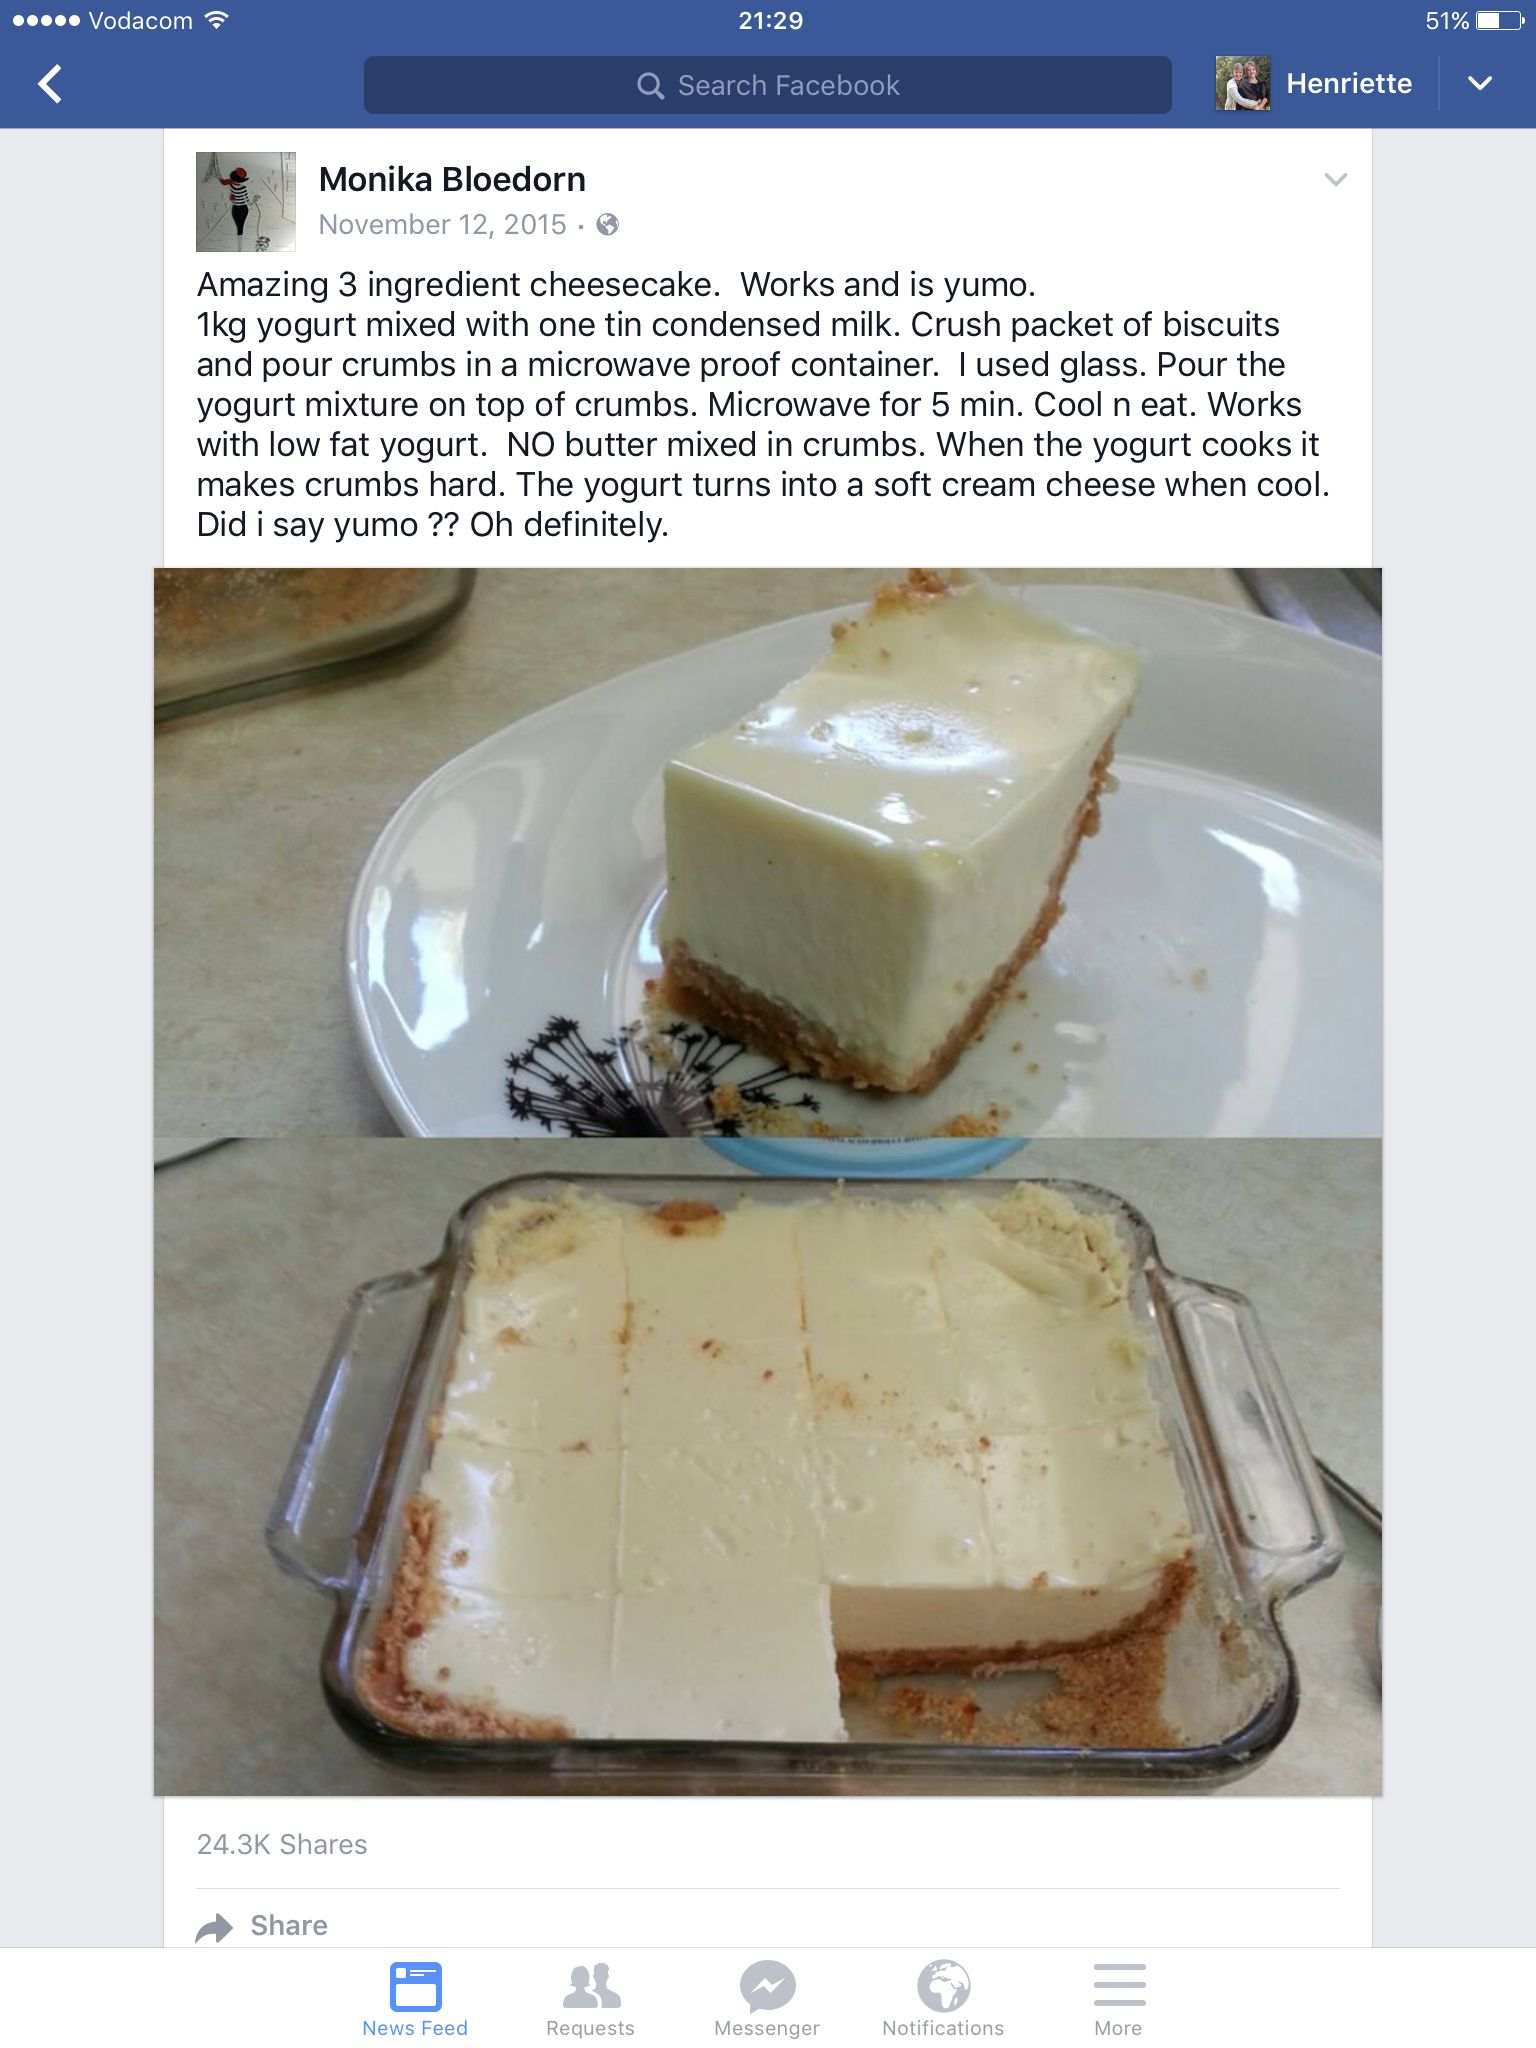 3 Ingredient Cheesecake 3 Ingredient Cheesecake Cake Recipes Dessert Recipes